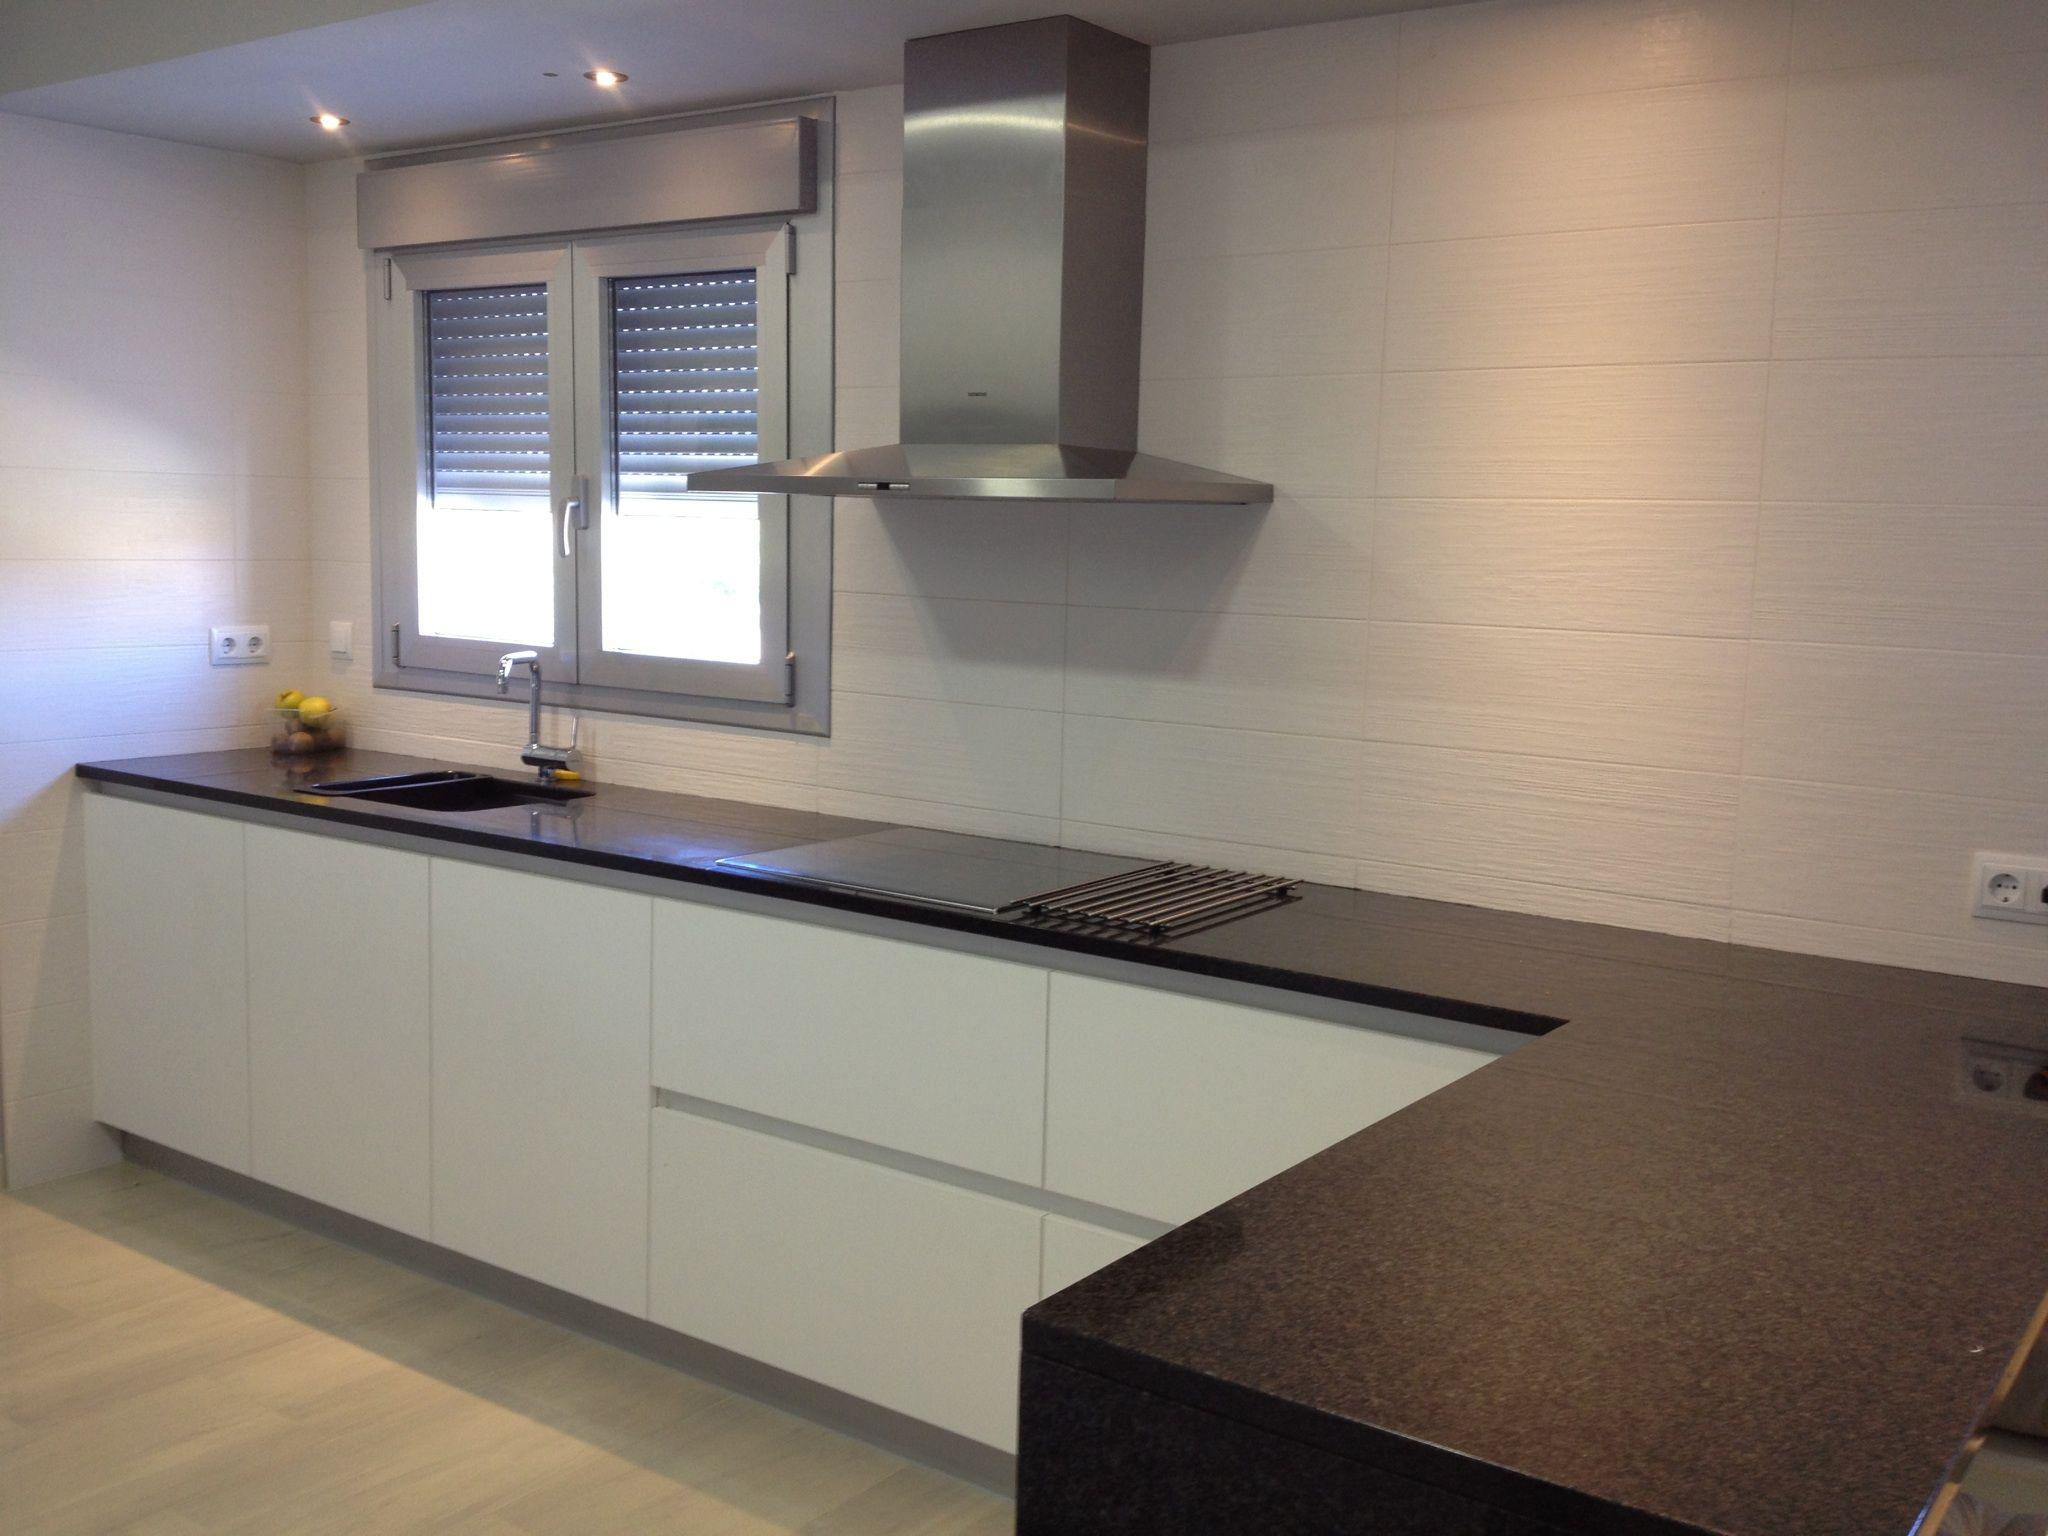 Cocina blanca con texturada con tirador gola encimera de for Muebles de cocina para encimera